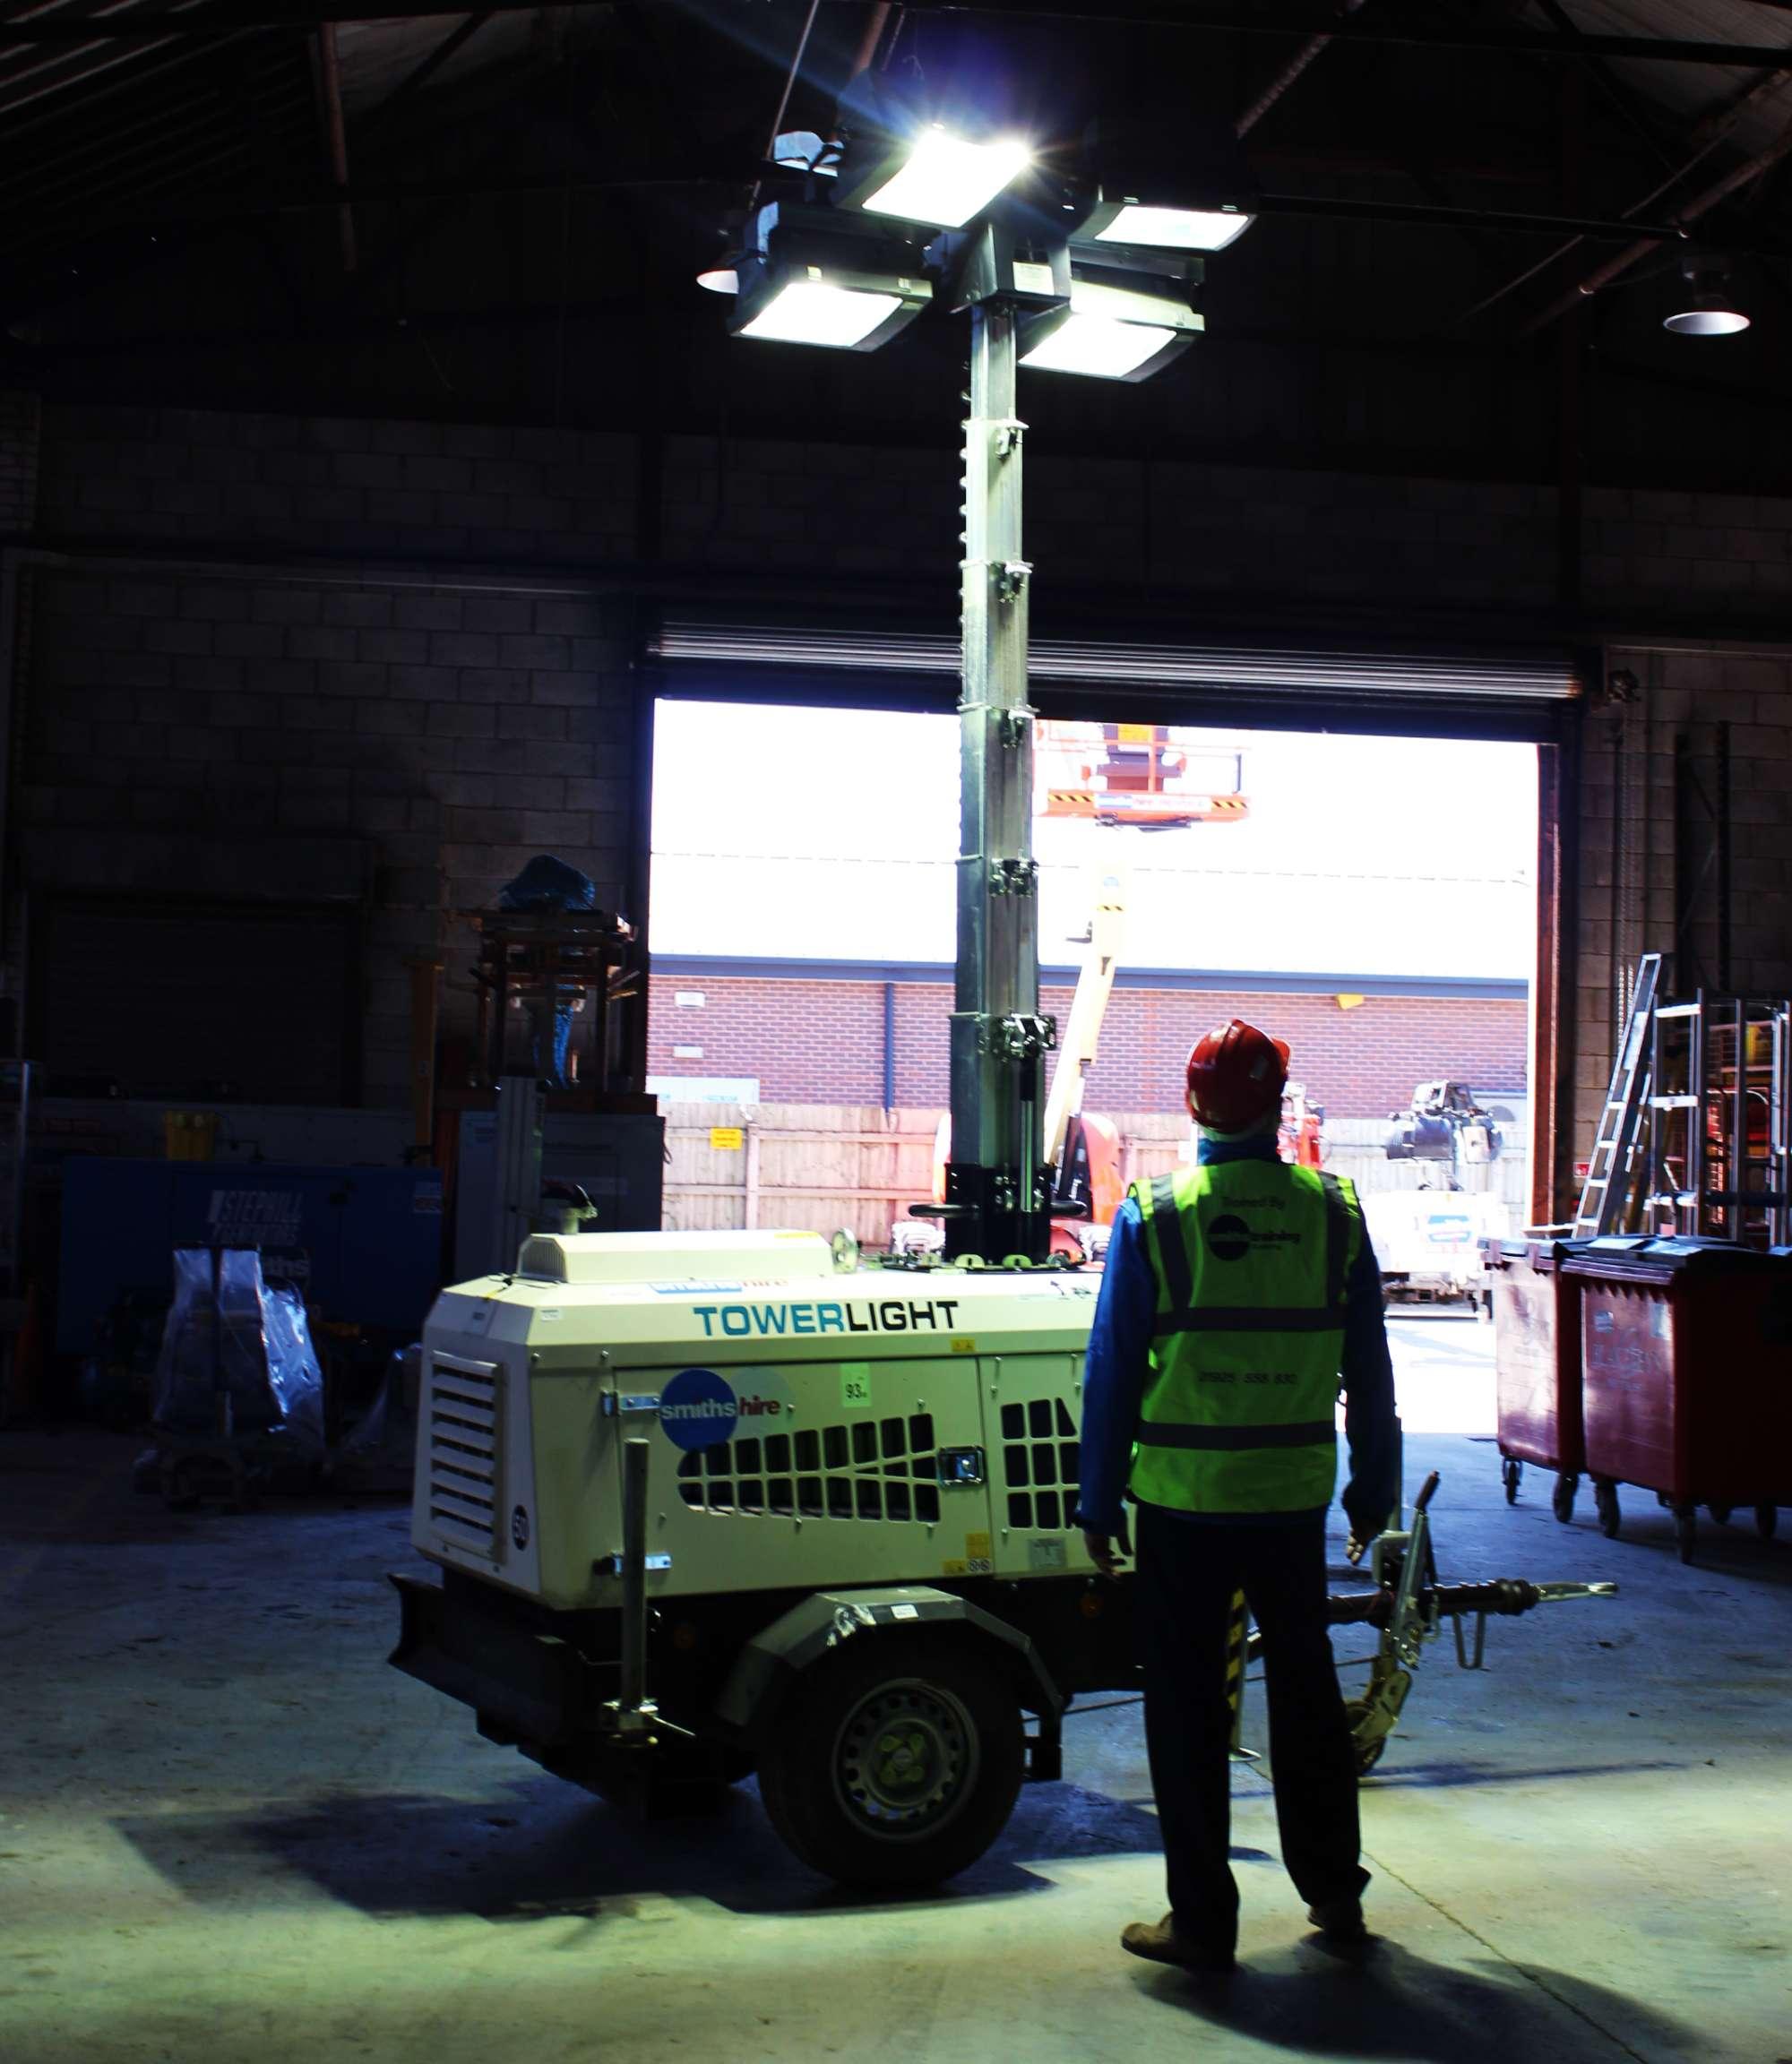 VT1 Eco 9.0m Lighting Tower